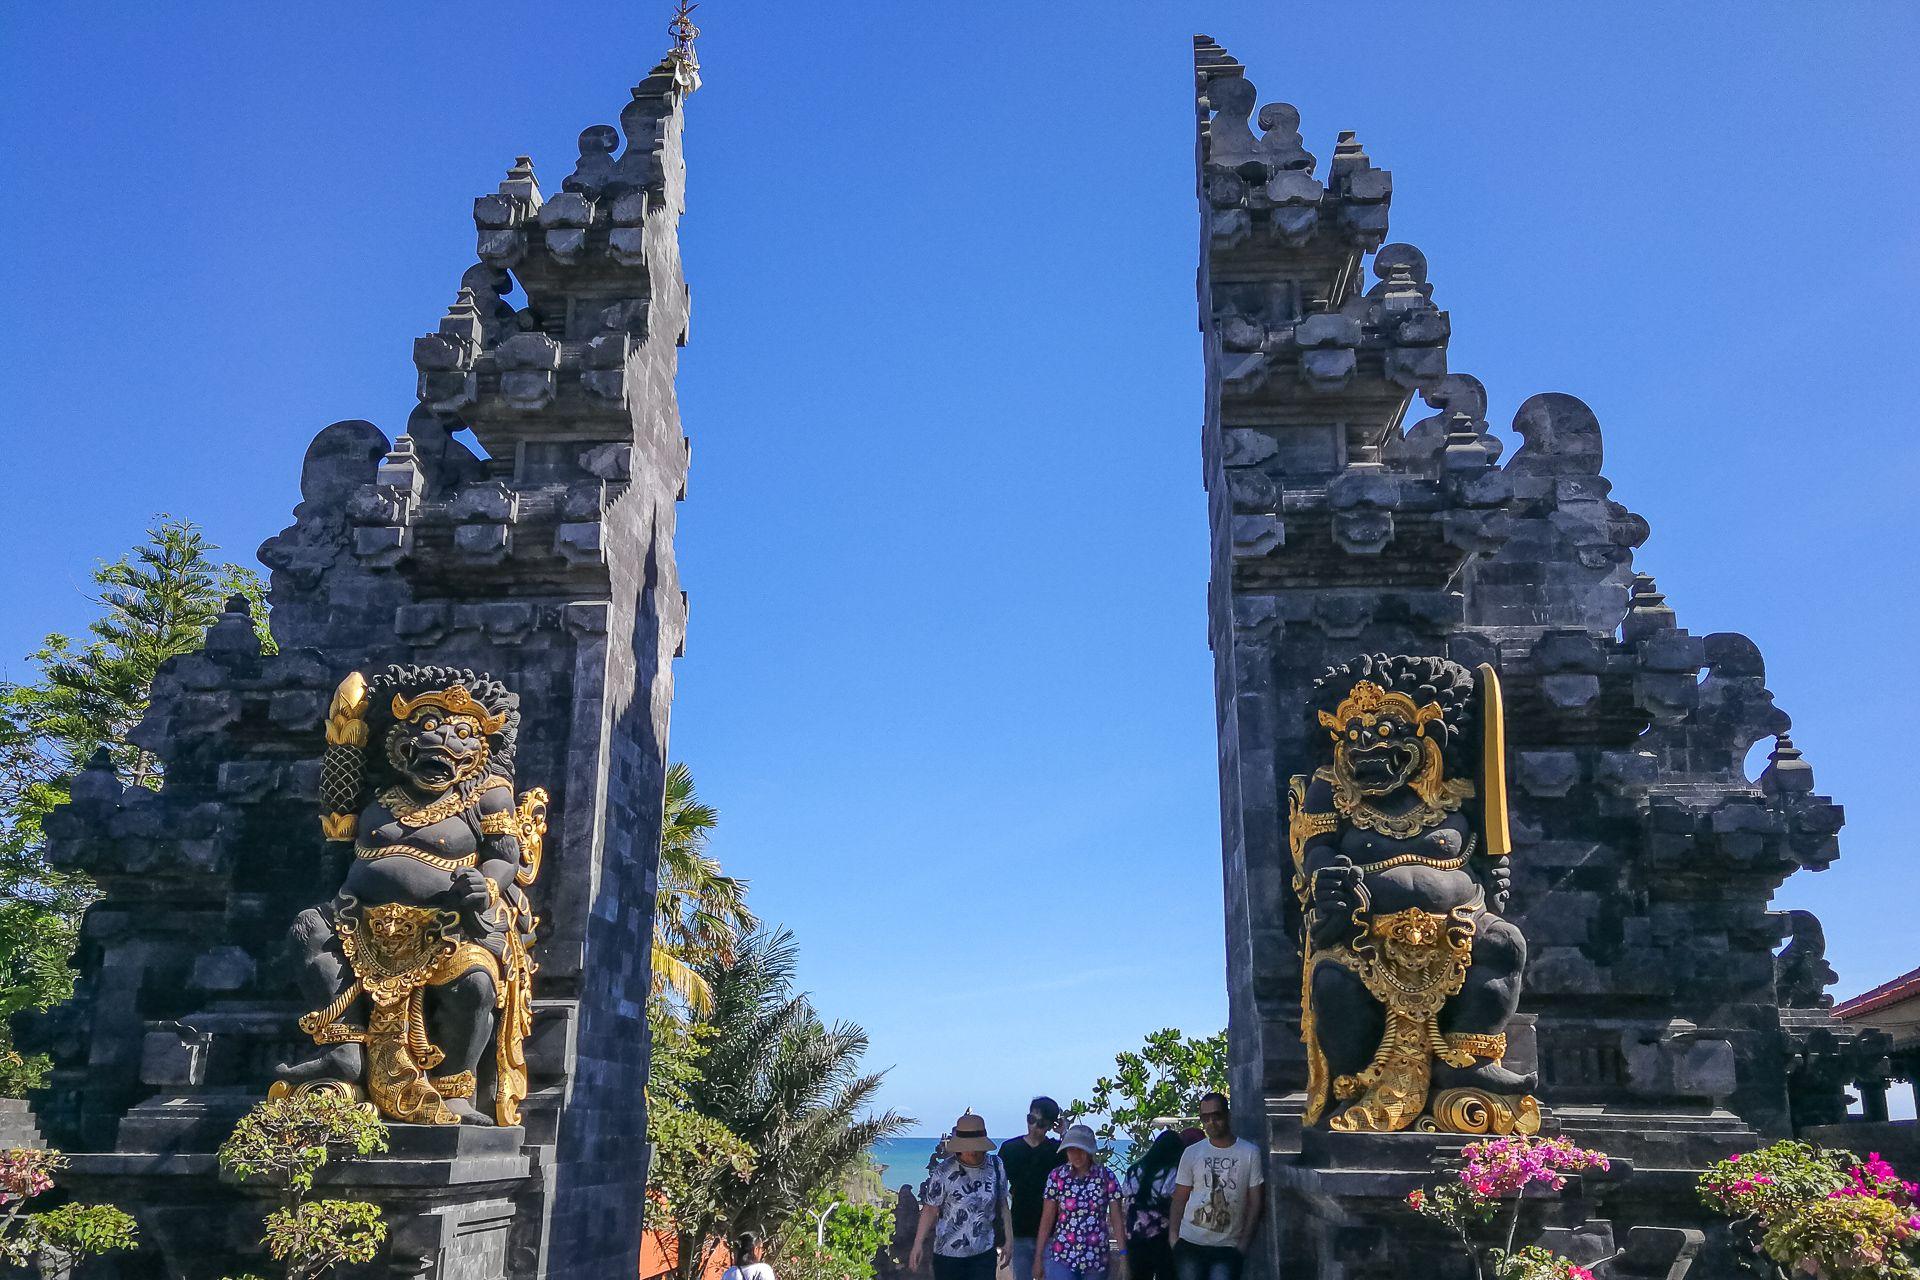 Bali, Indonesia, Southeast Asia, love Bali, foto Bali, travel, Бали, путешествие на Бали, отпуск на Бали, фото Бали, остров Бали, Индонезия, остров богов и демонов, жизнь на Бали, культура Бали, впечатления от Бали, Бали или Самуи, где лучше в Таиланде или на Бали, храмы Бали